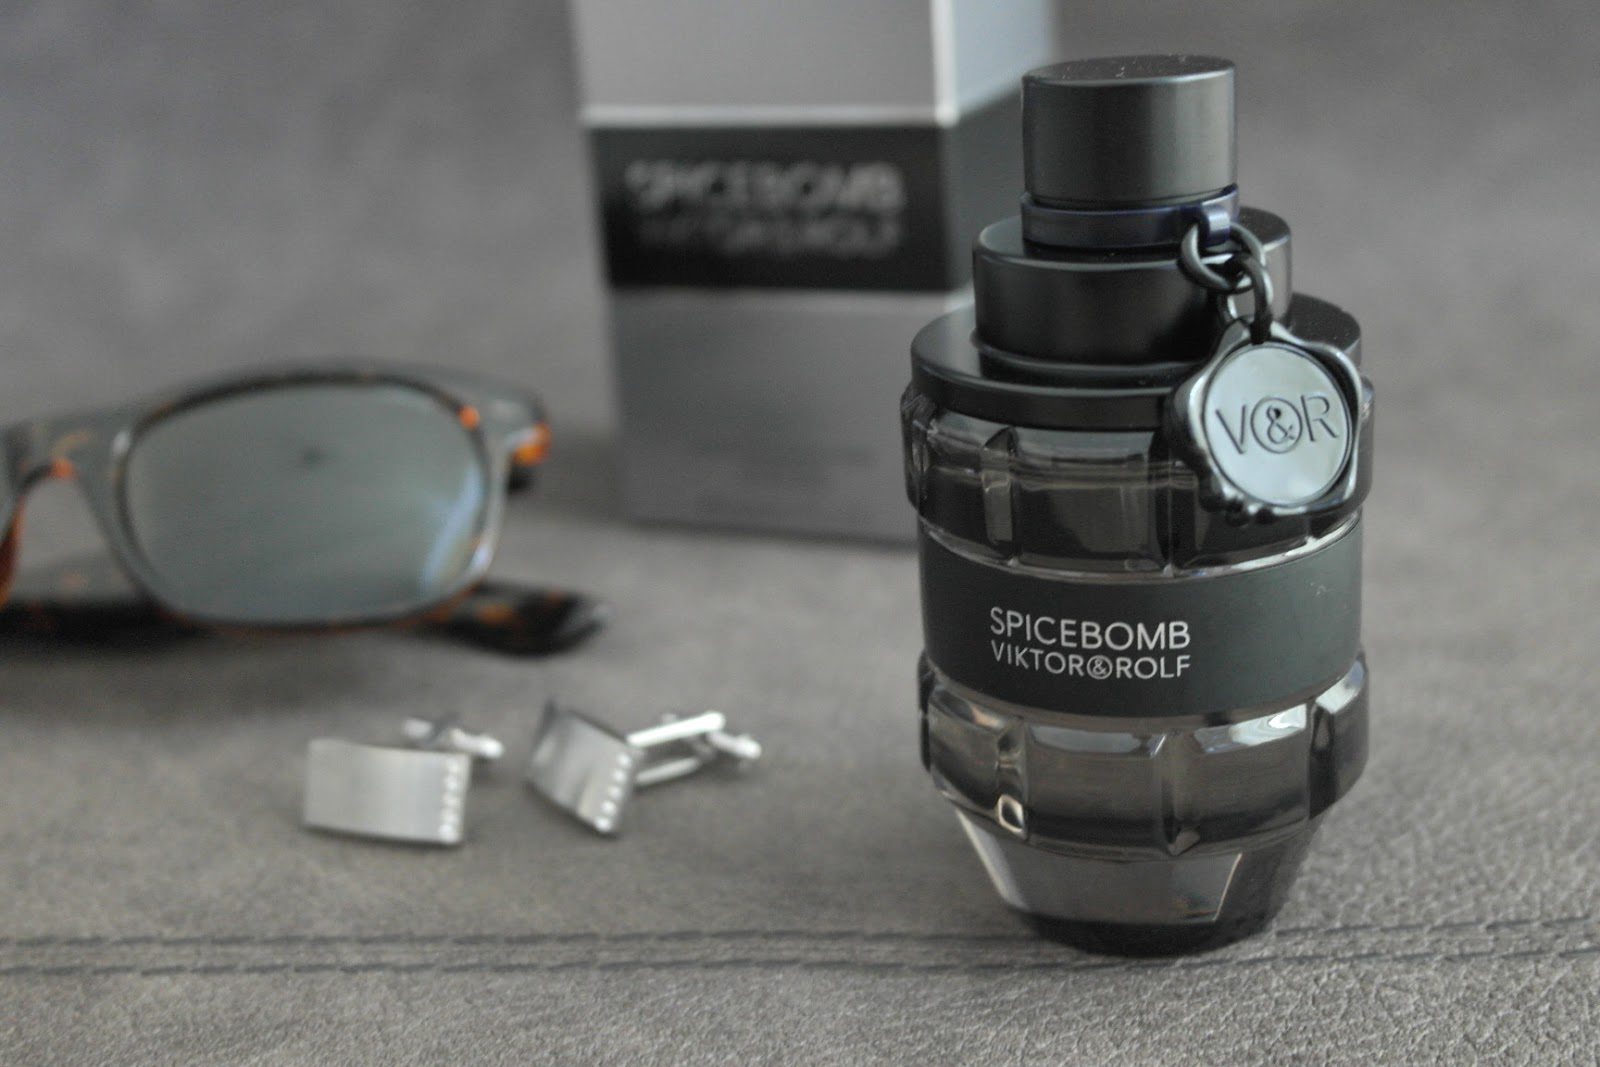 Viktor & Rolf Spicebomb Review